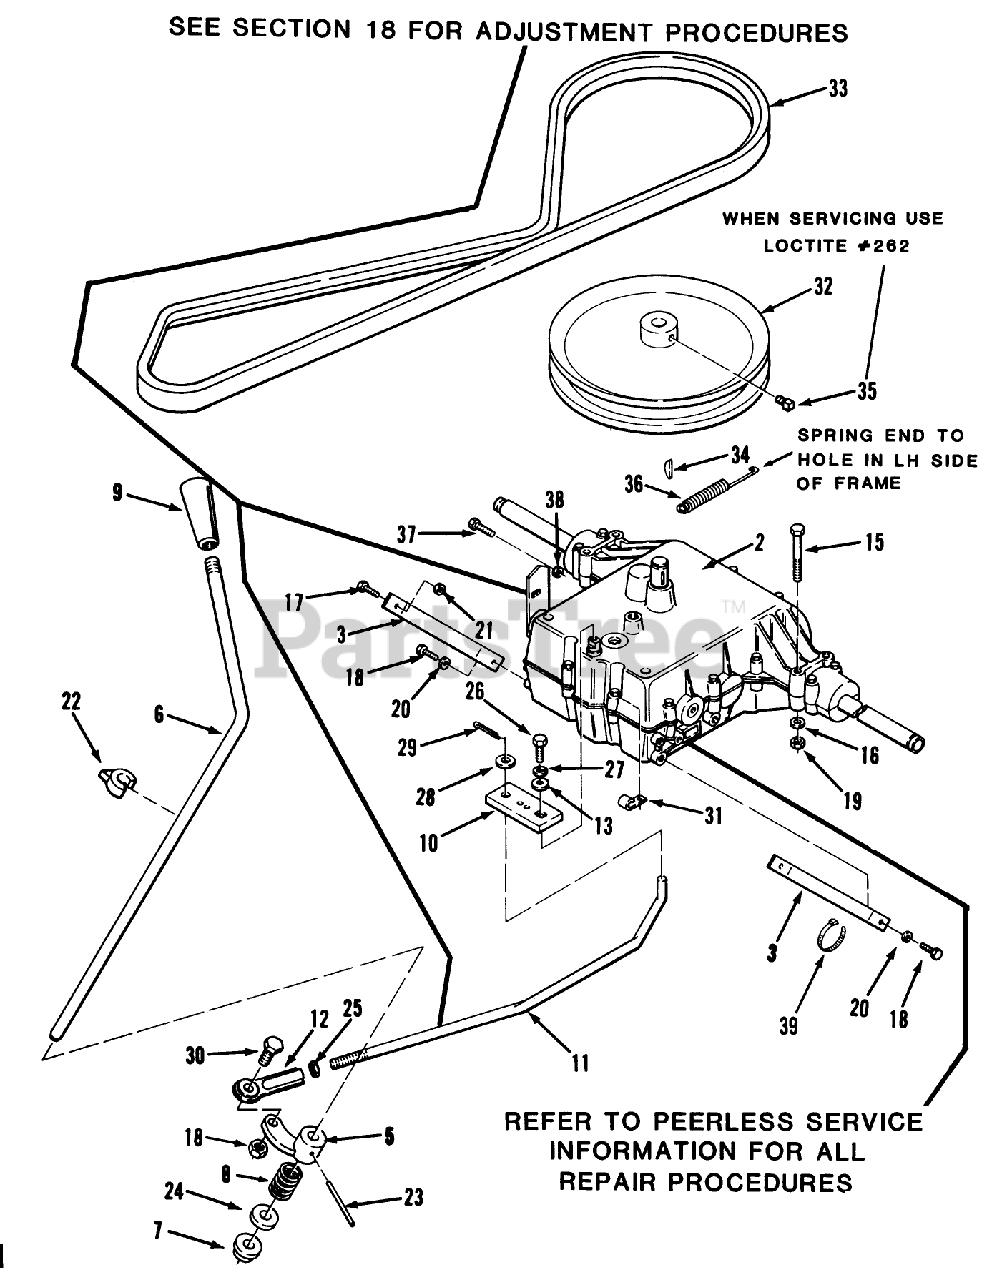 Toro Wheel Horse Parts Lookup : wheel, horse, parts, lookup, 32-10B501, (210-5), Tractor, (1990), 5-SPEED, TRANSMISSION, Parts, Lookup, Diagrams, PartsTree